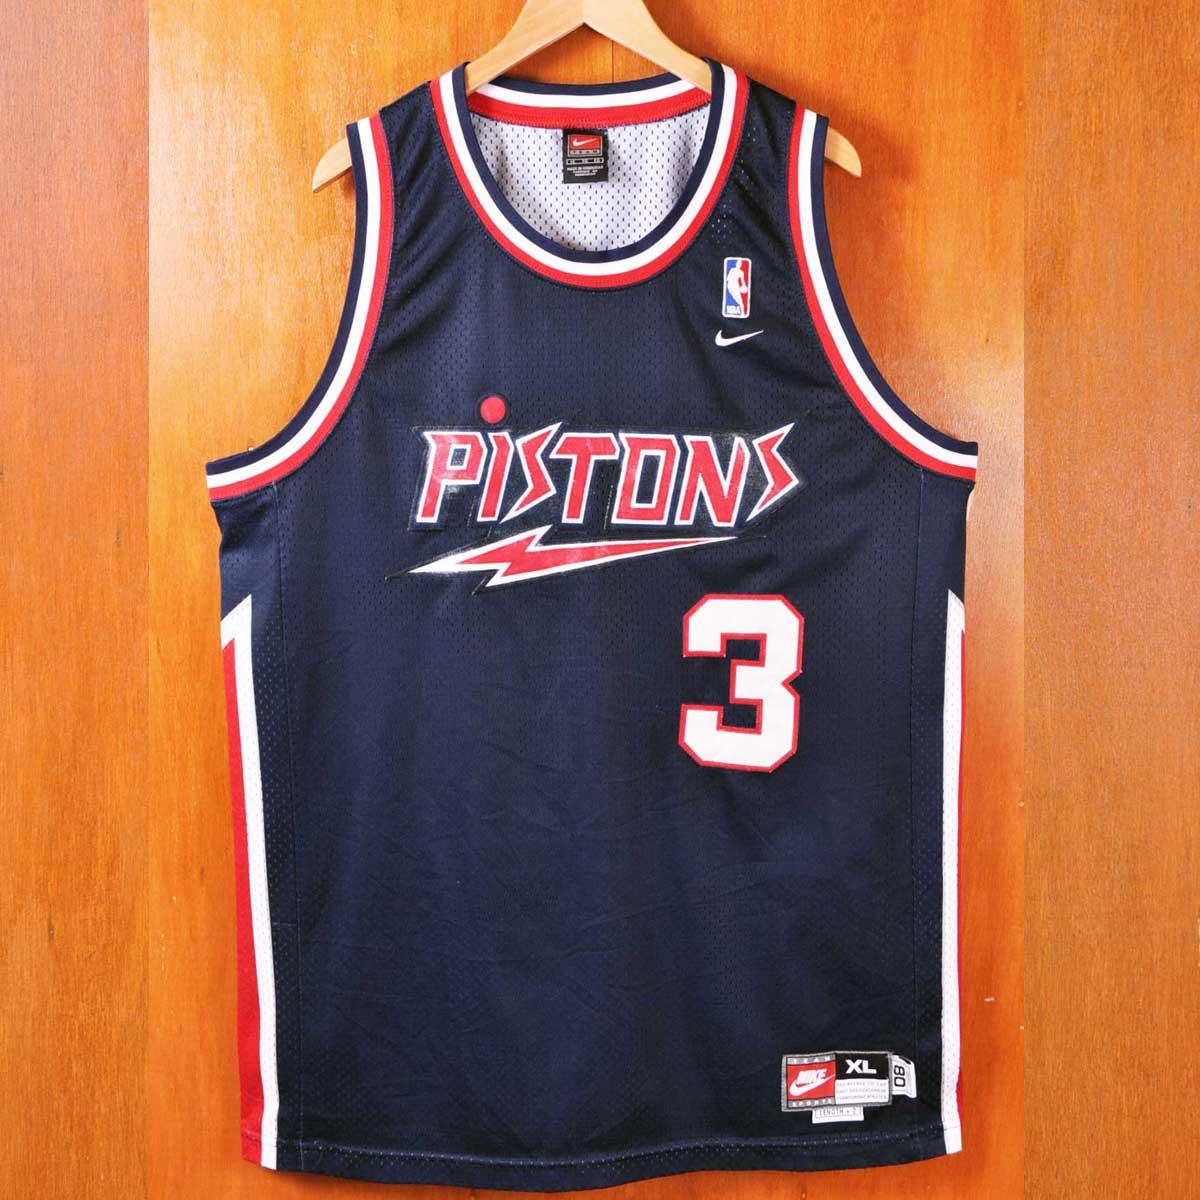 hot sale online 0e907 8bf53 NIKE Nike NBA Detroit Pistons Detroit Pistons Ben Wallace basketball tank  top uniform numbering navy men XL▼